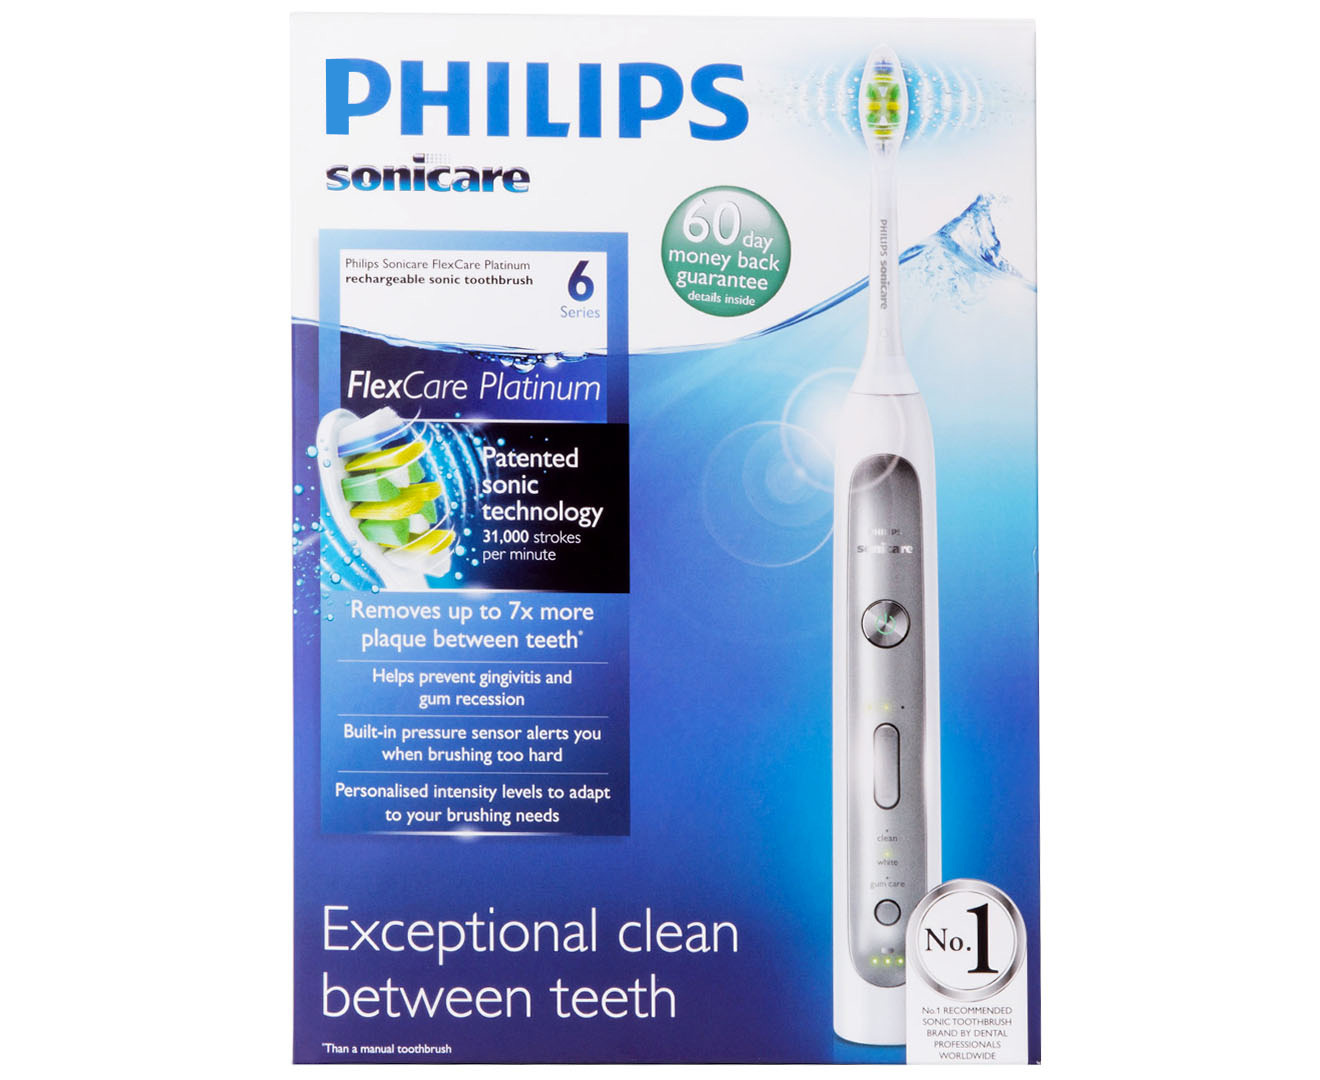 Philips Sonicare Flexcare Platinum Electric Toothbrush